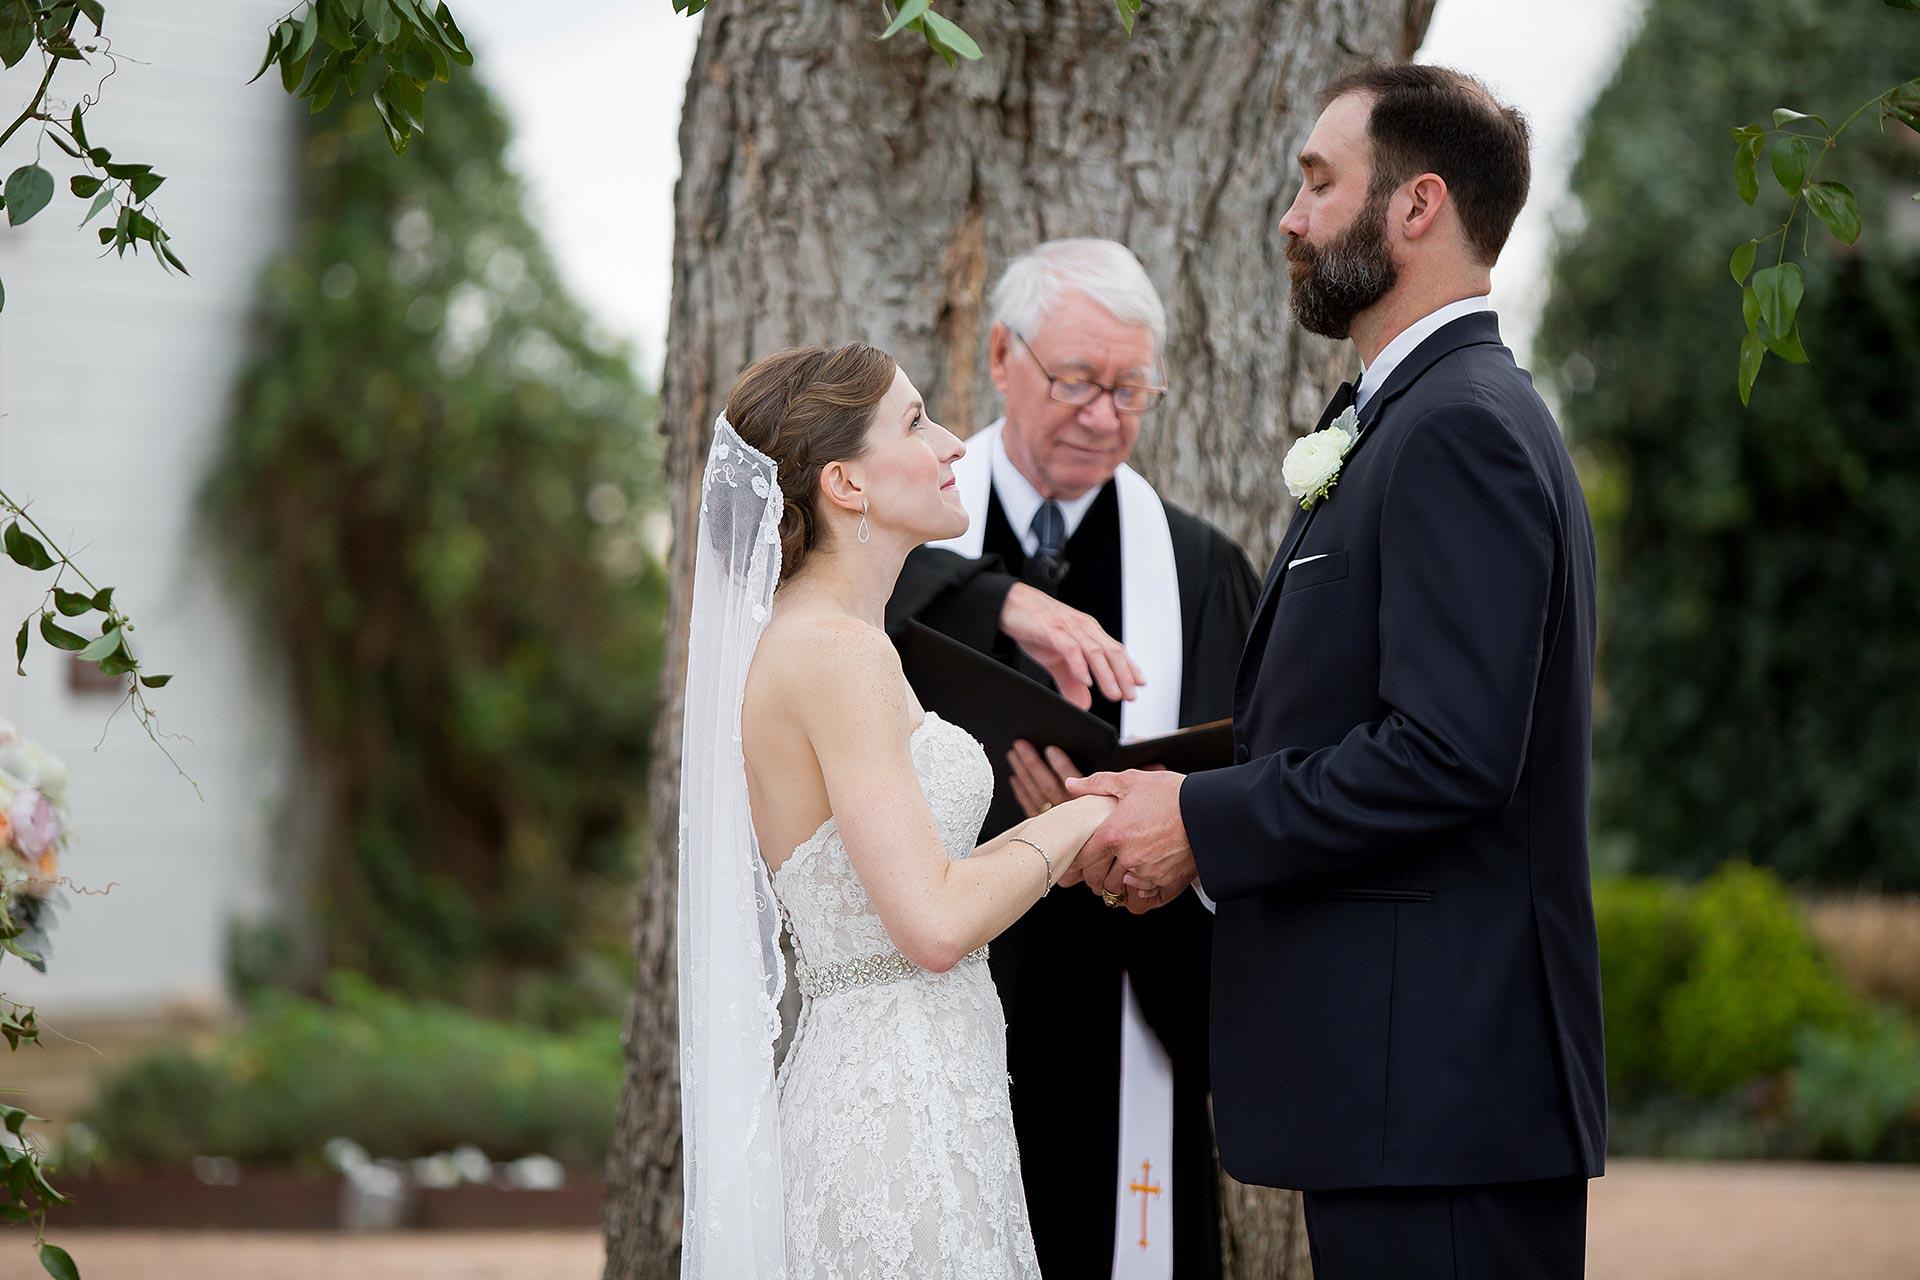 Austin Wedding at Barr Mansion